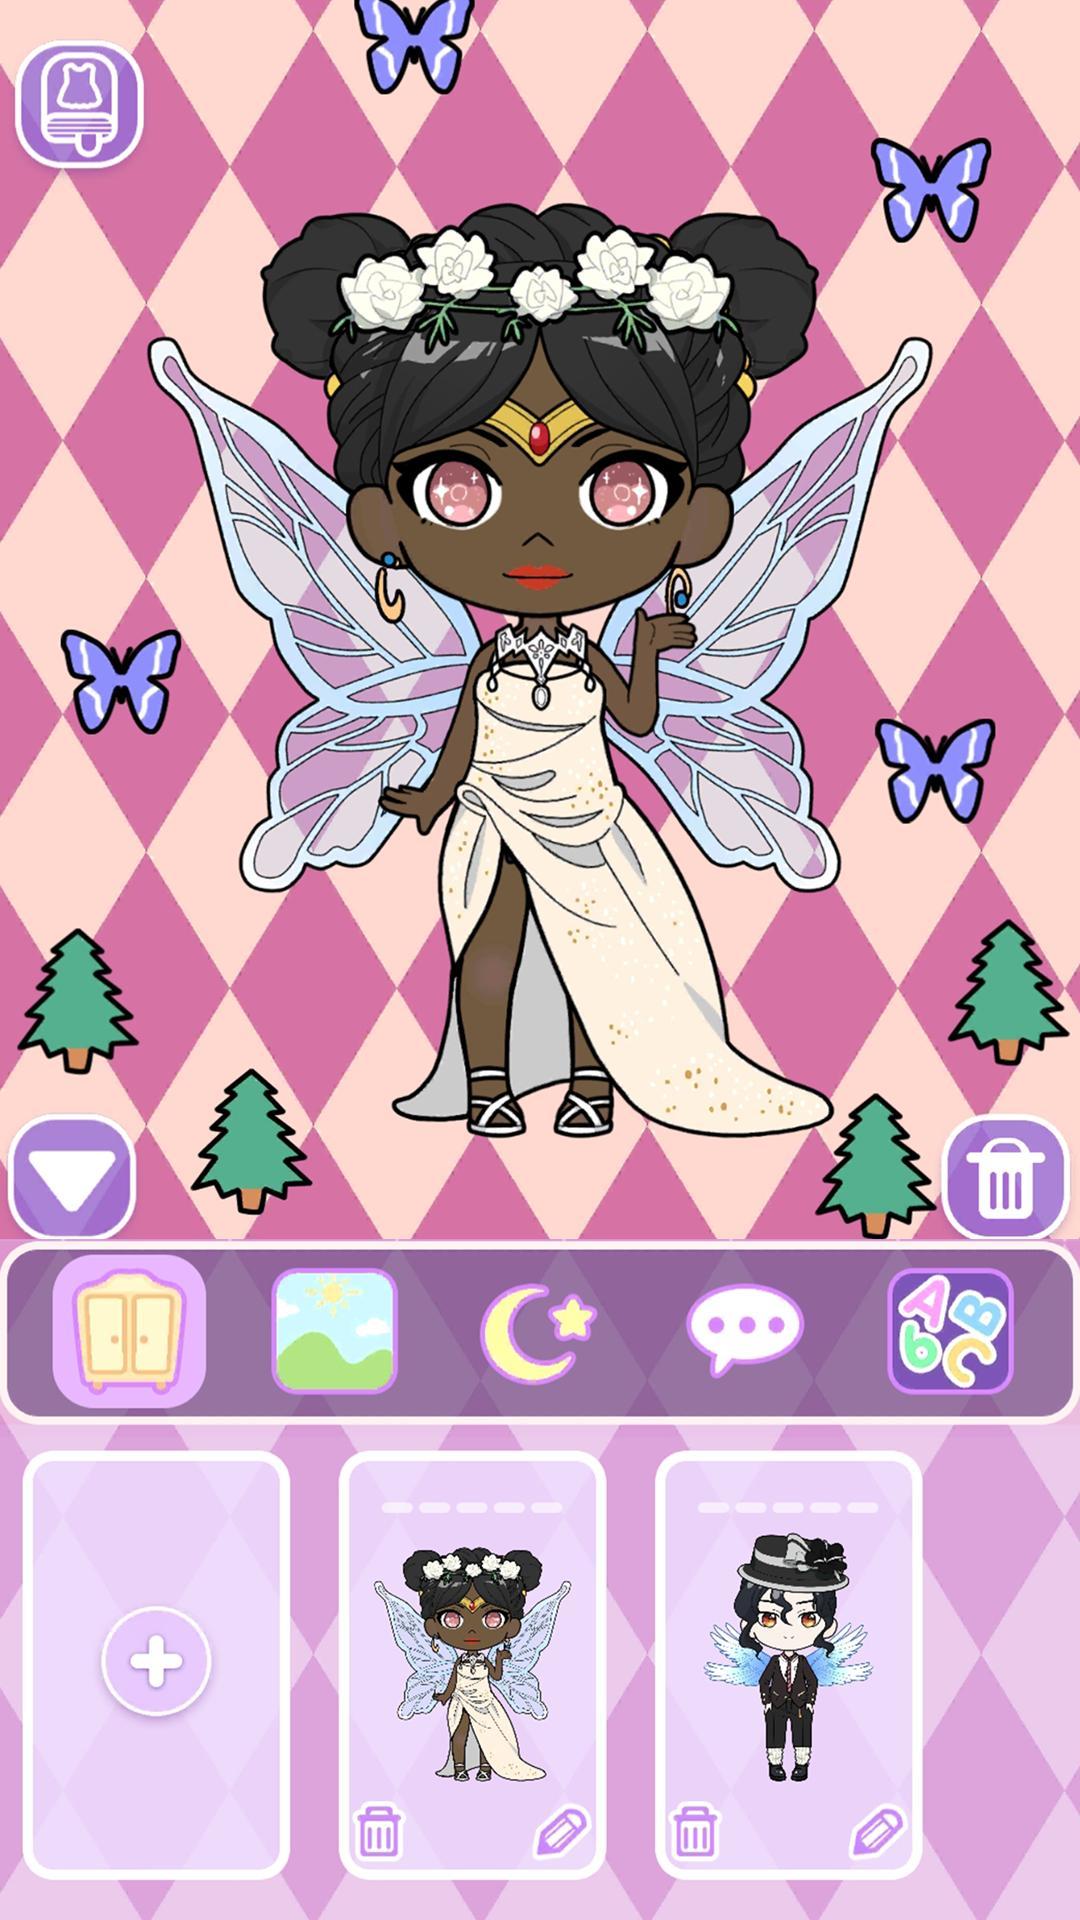 Vlinder Doll Dress up Games , Avatar Creator 1.2.1 Screenshot 9